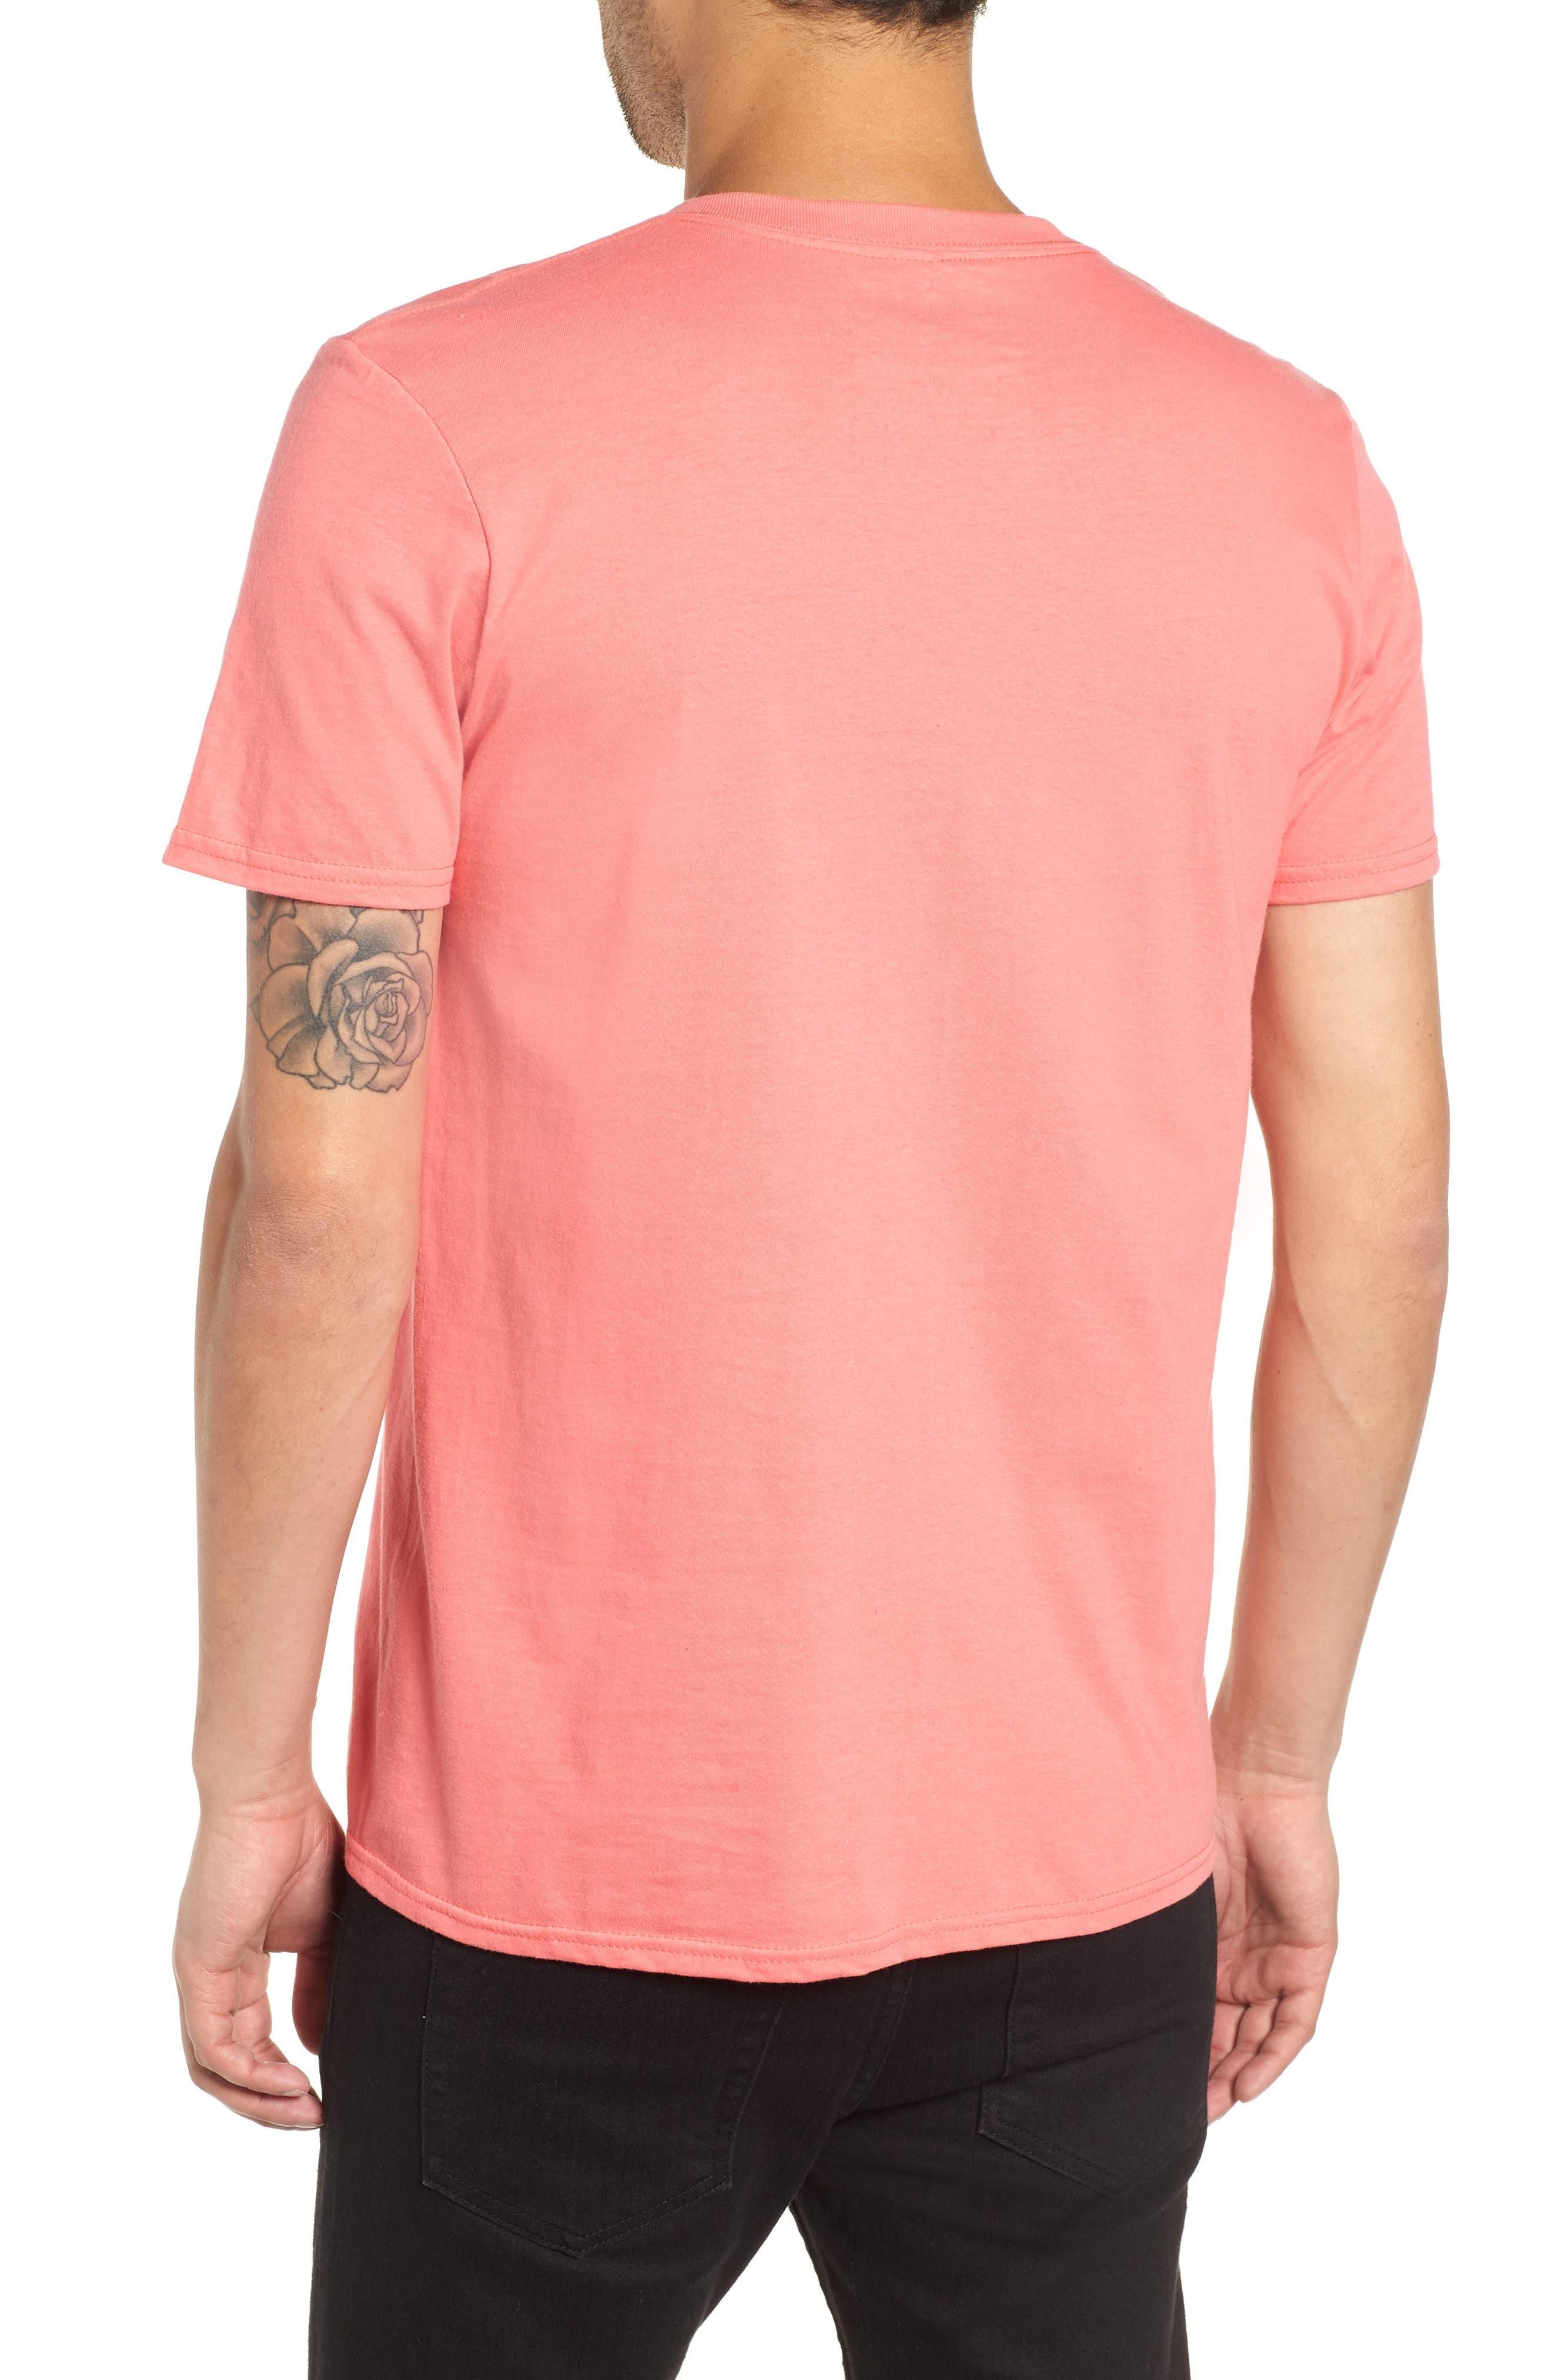 Zoit Graphic T-Shirt,                             Alternate thumbnail 2, color,                             CORAL ZOIT